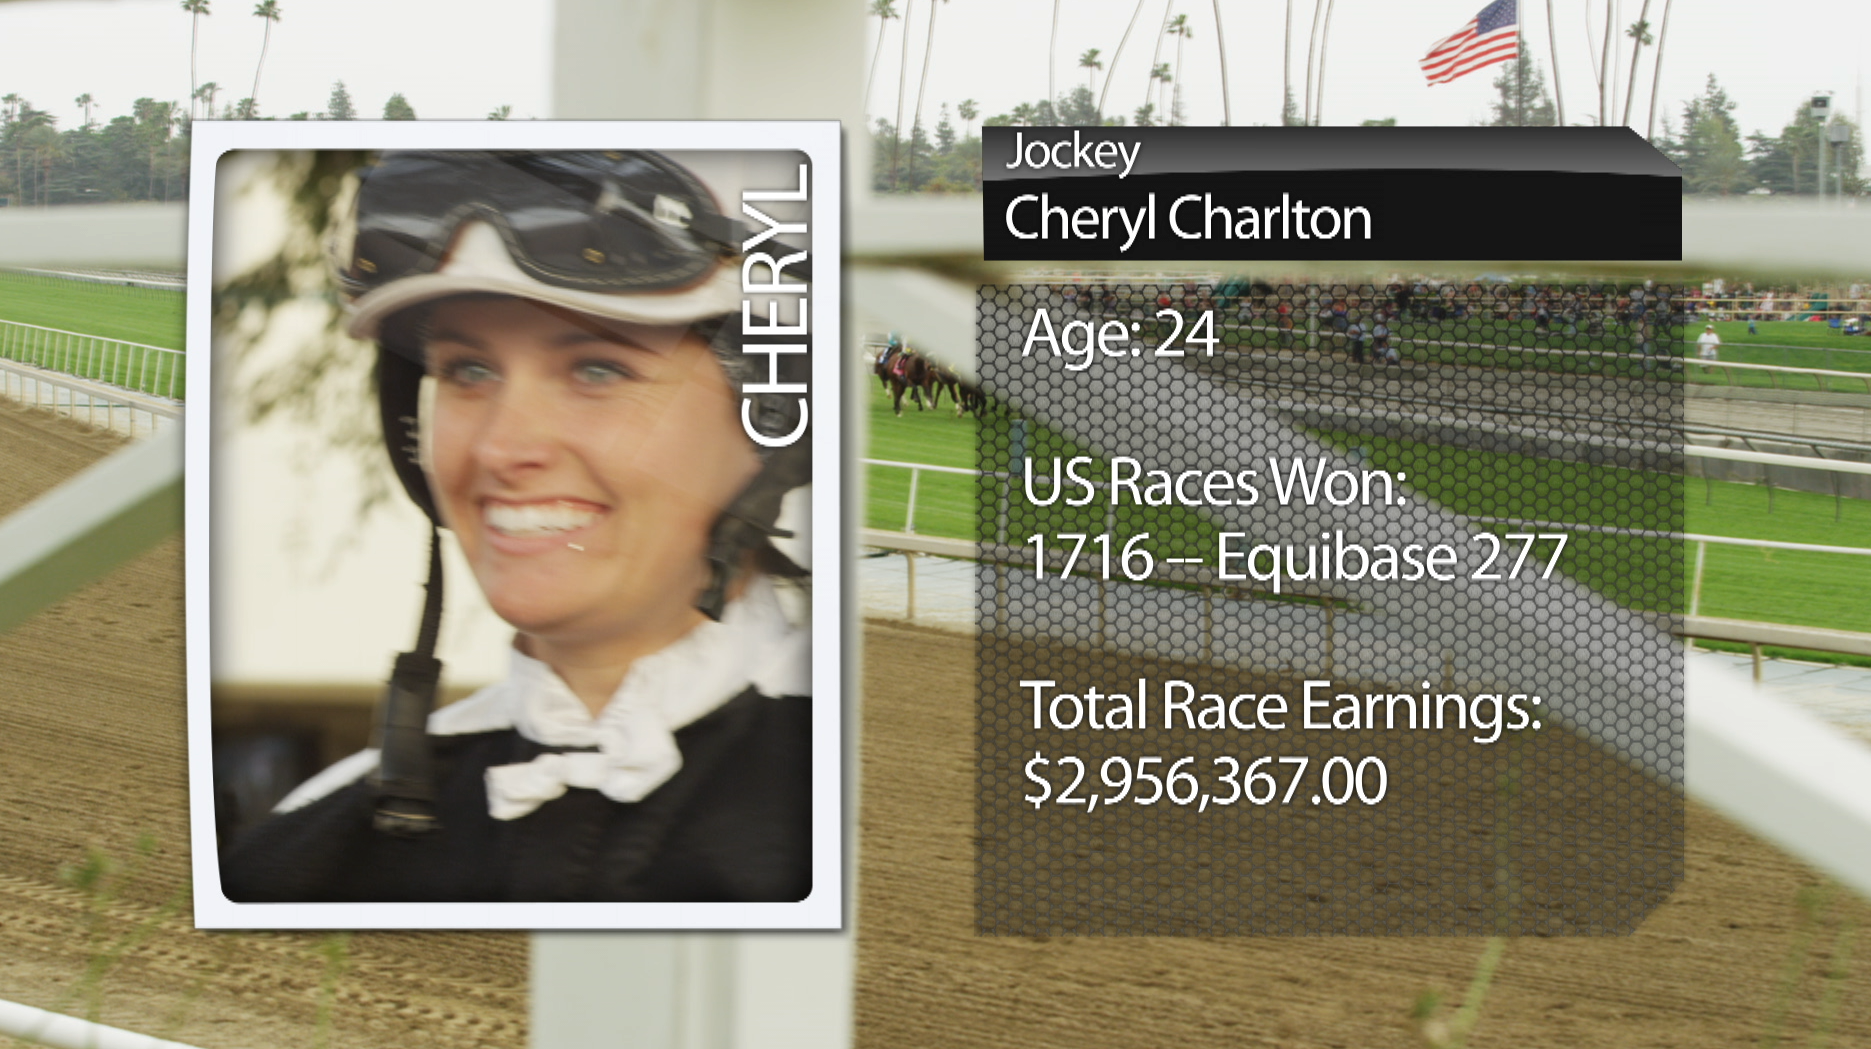 Cheryl Charlton